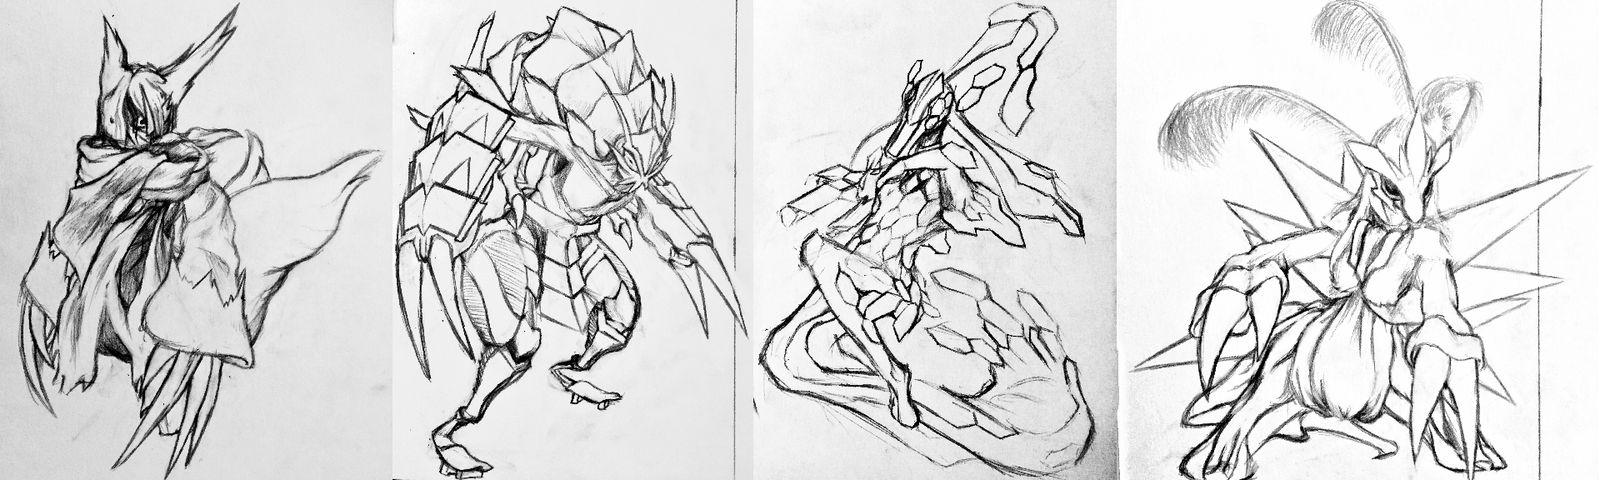 Sketchtember Cultists Batch 6 by Falgaia